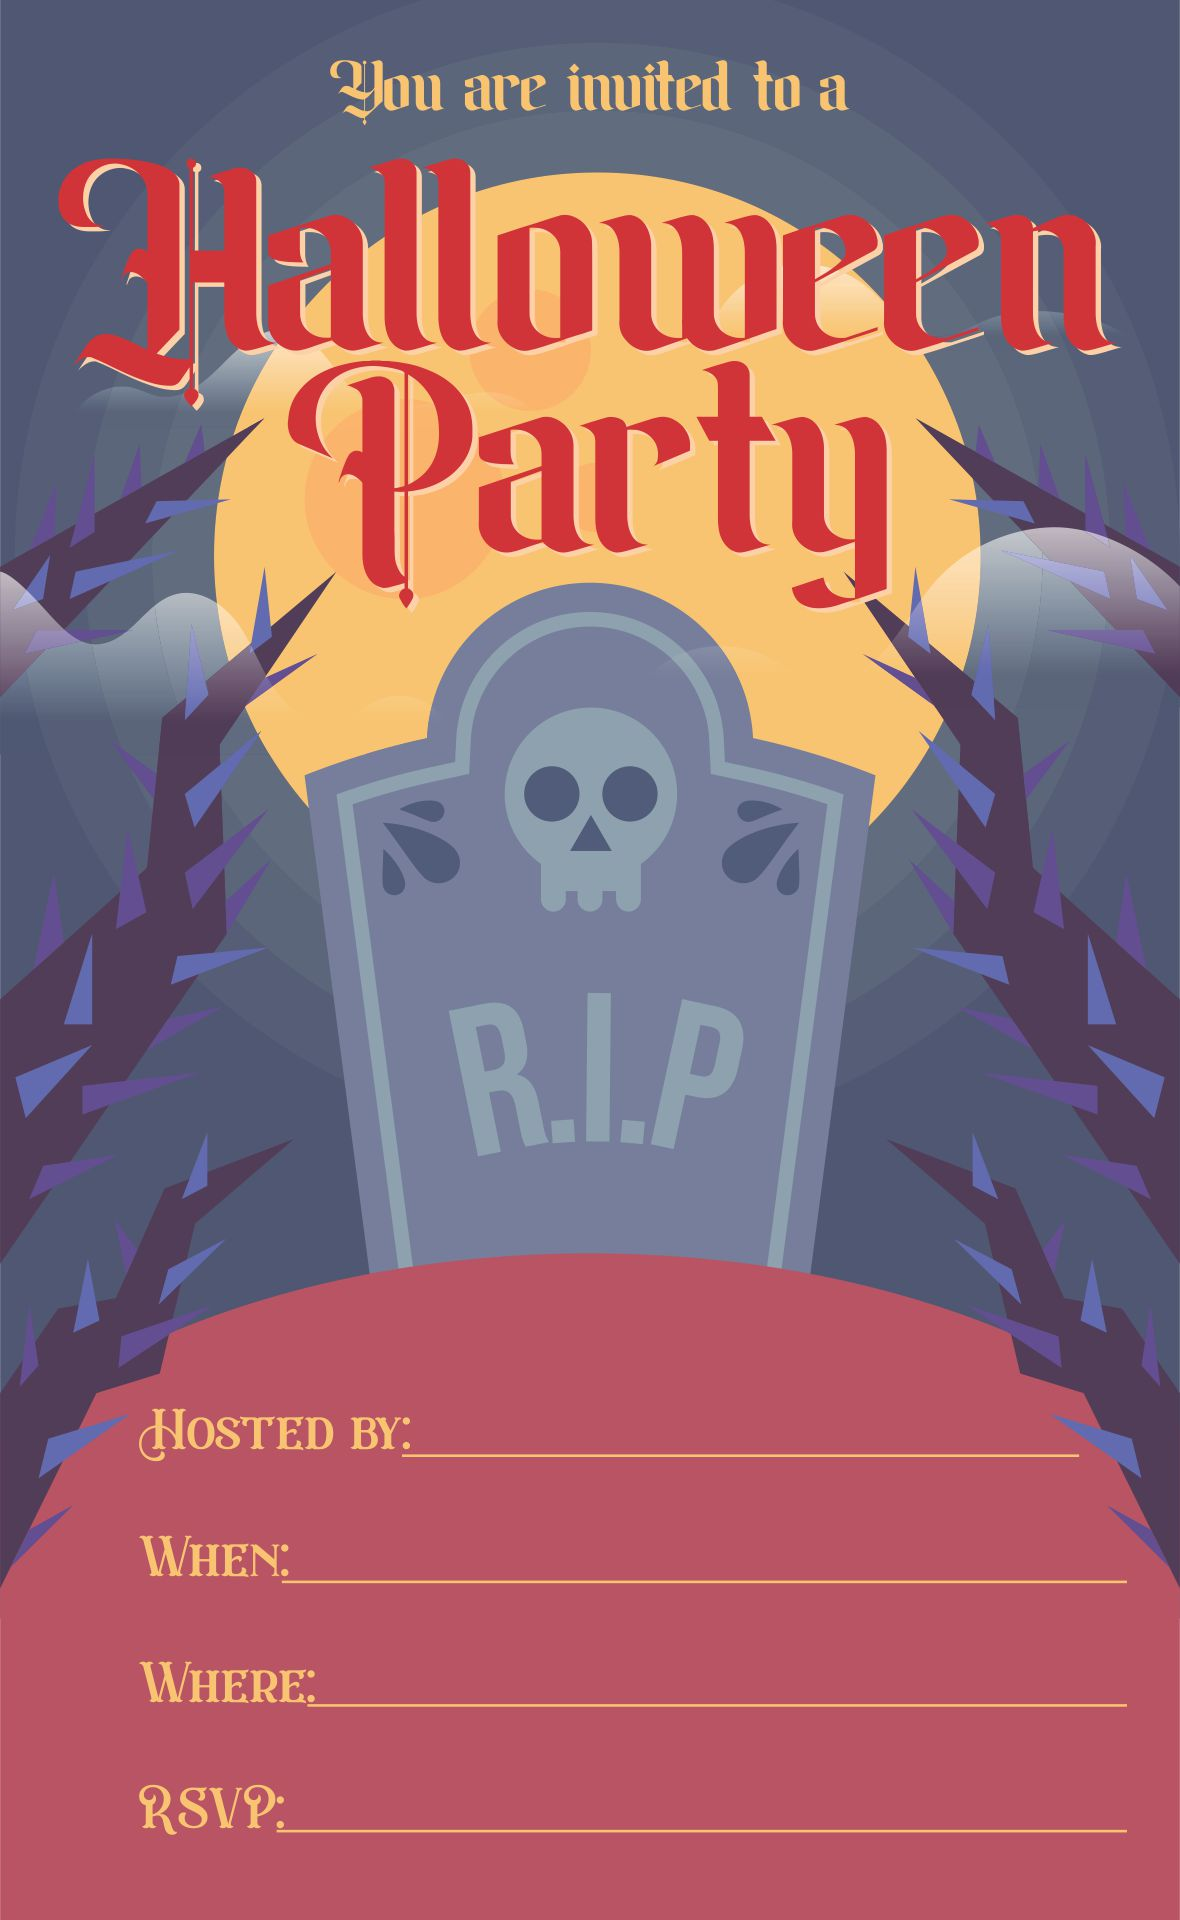 Unique Halloween Party Invitations for amazing invitation ideas